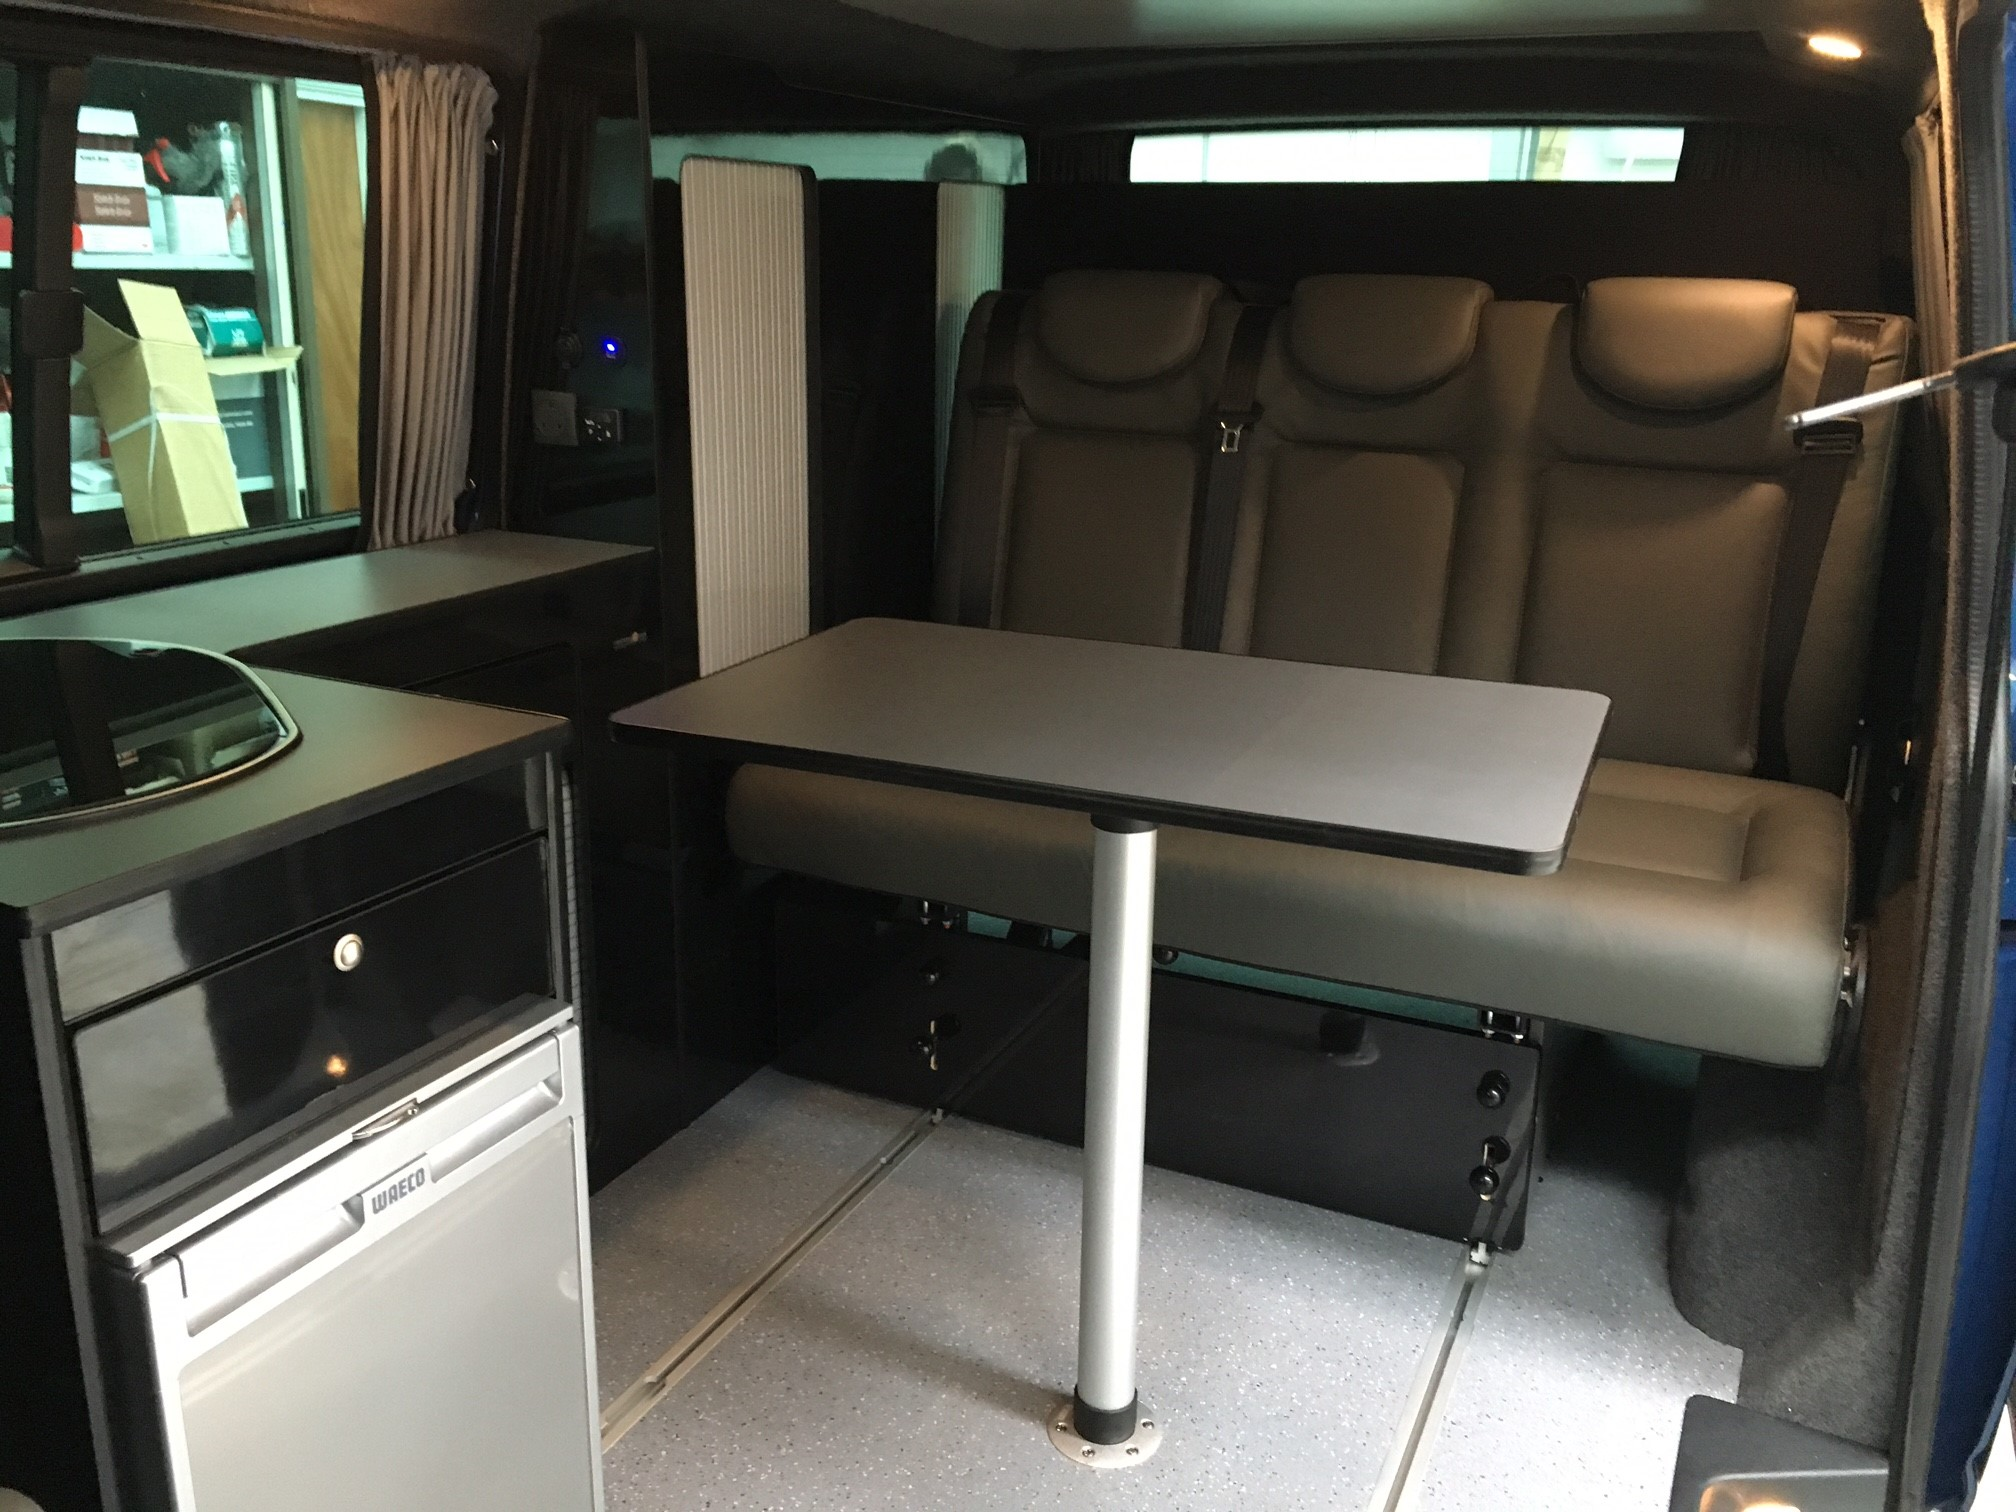 Reimo seat on rails Vauxhall Vivaro Rear Conversion Revampavan - VW Camper Conversions Bournemouth Dorset UK